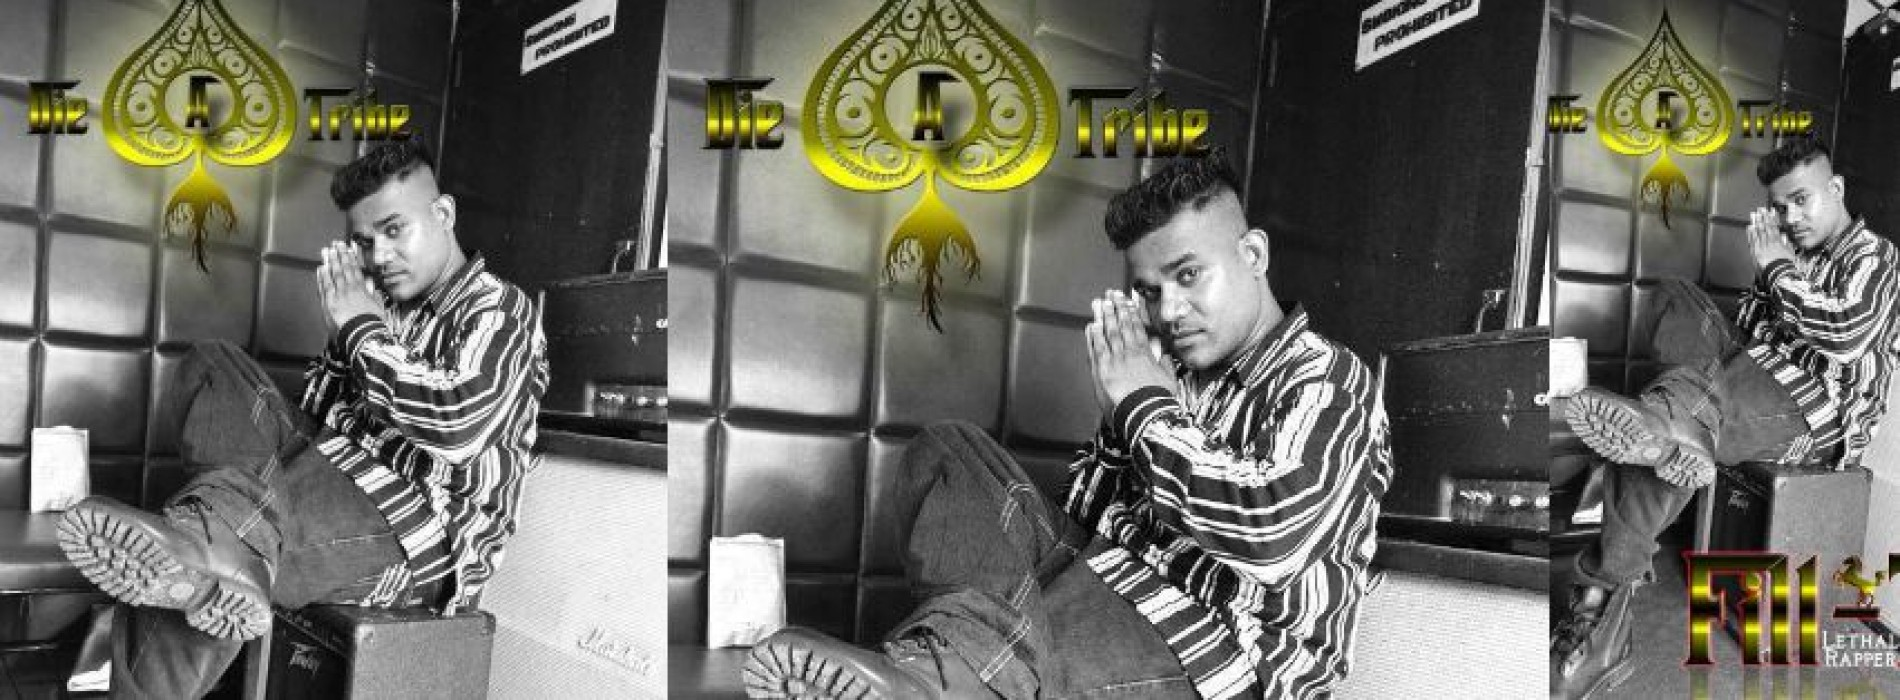 "Fill T Talks About That Massive Sinhala Hip Hop & Rap Collaboration – ""Ginna"""